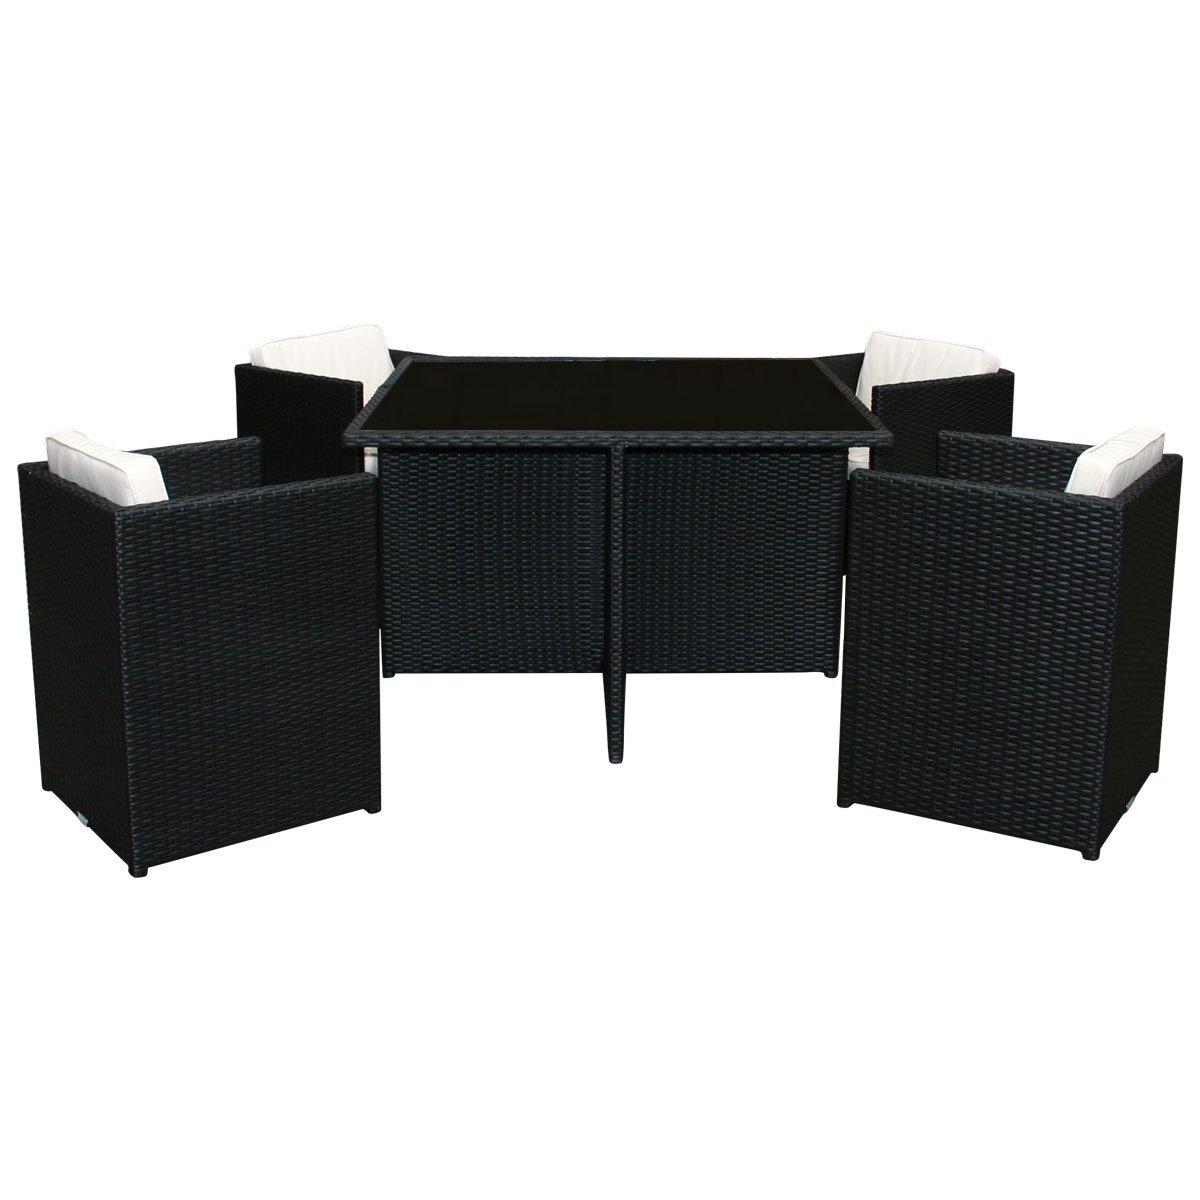 Bentley Garden - Korbmöbel-Set - Rattan-Optik - Glastisch & 4 Stühle - Schwarz & Creme - 5-teilig